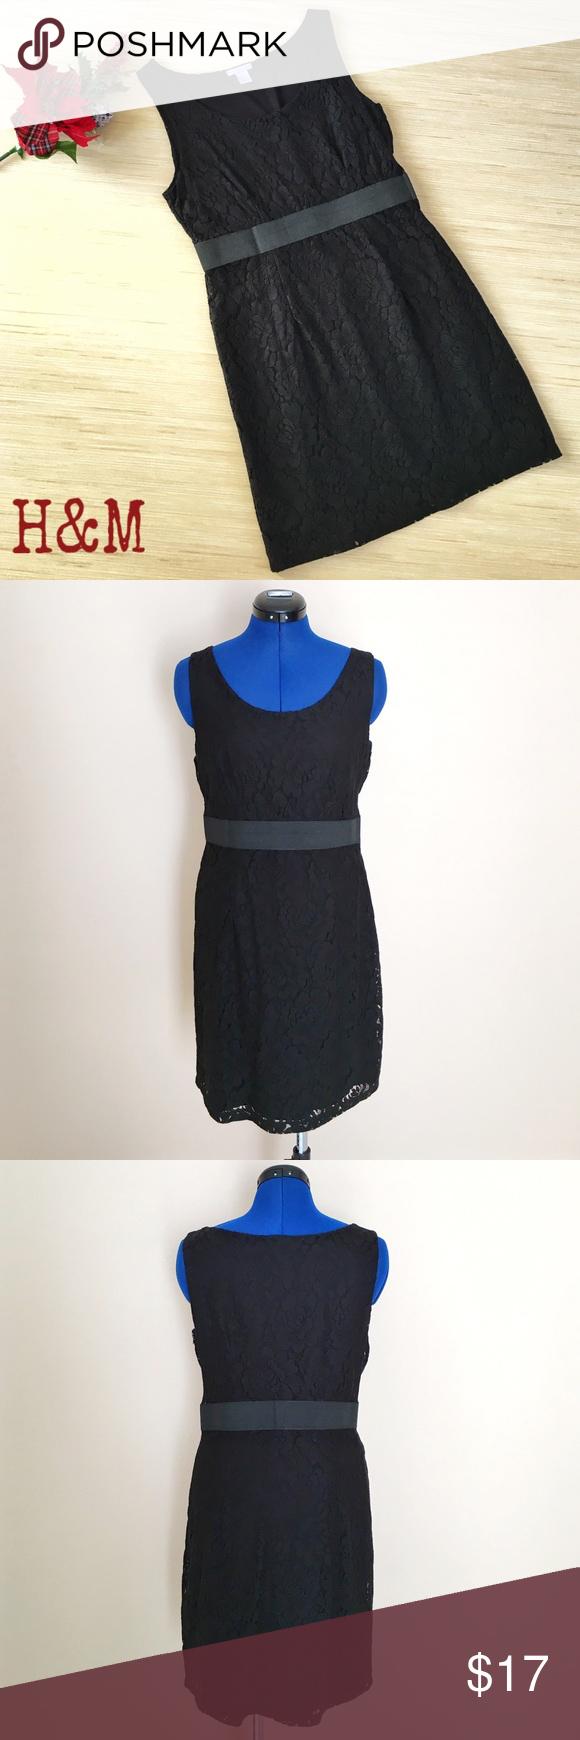 H M Sleeveless Black Lace Dress Size 12 Clothes Design Perfect Little Black Dress Fashion Design [ 1740 x 580 Pixel ]